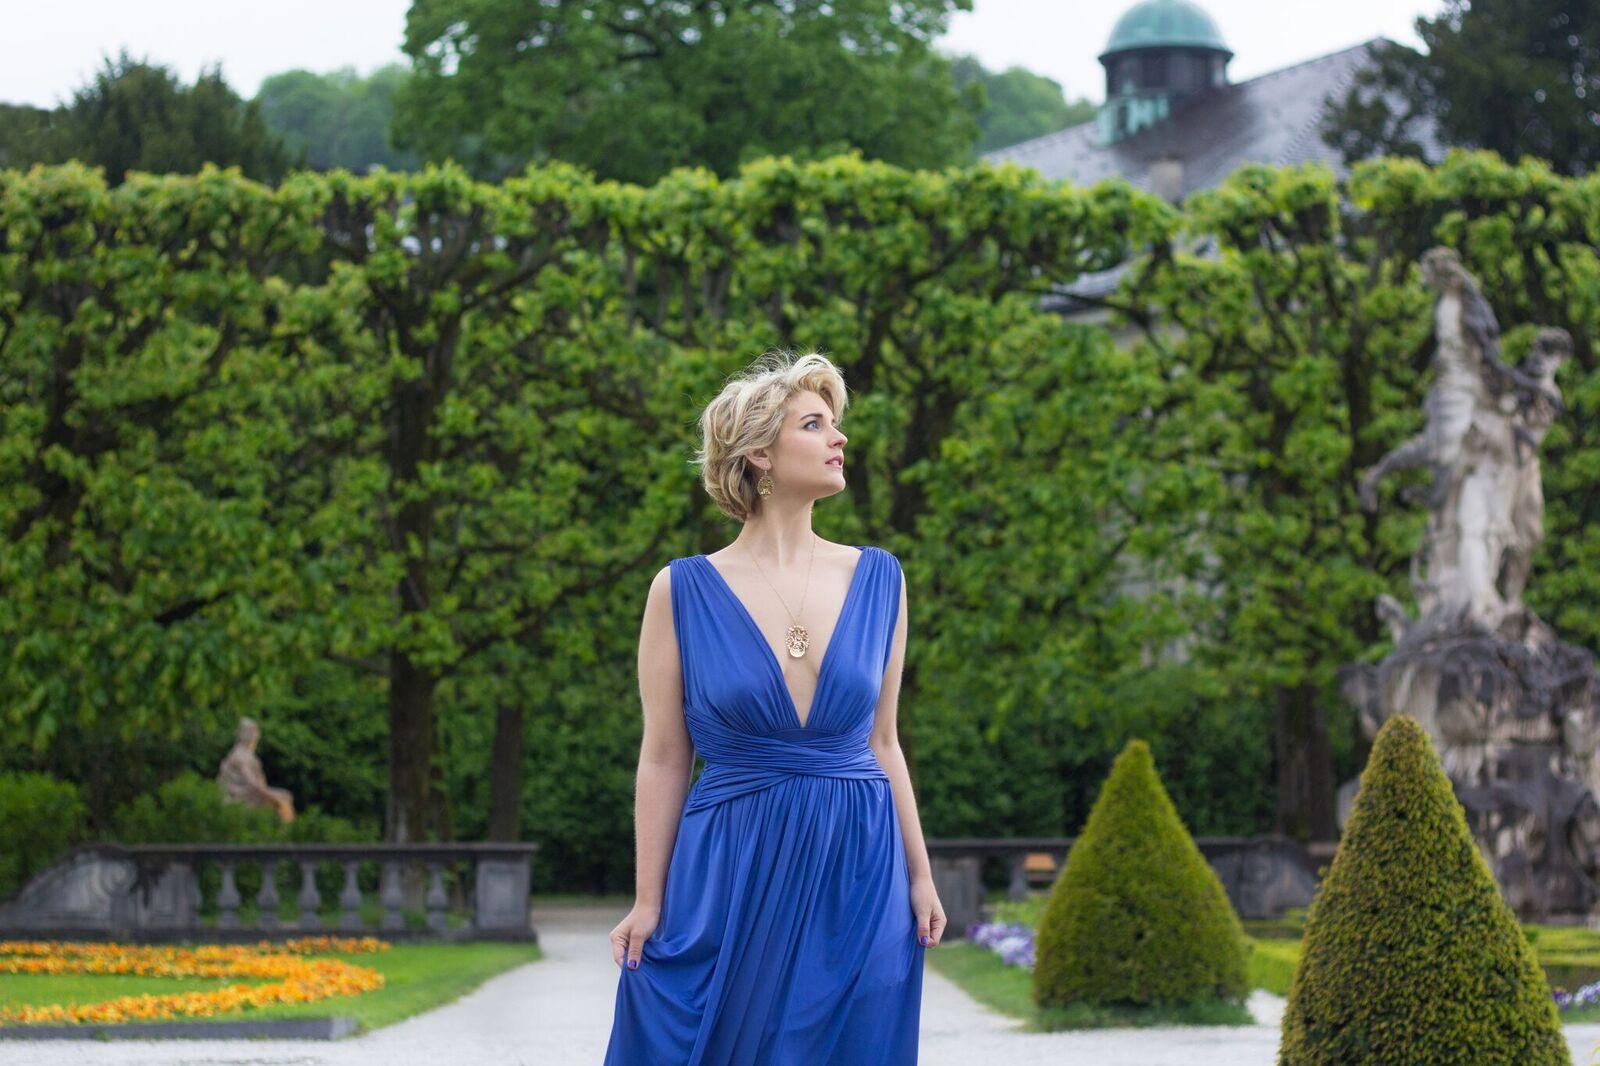 Soprano Veronika Obermeir. Photo by Melissa Zgouridi.